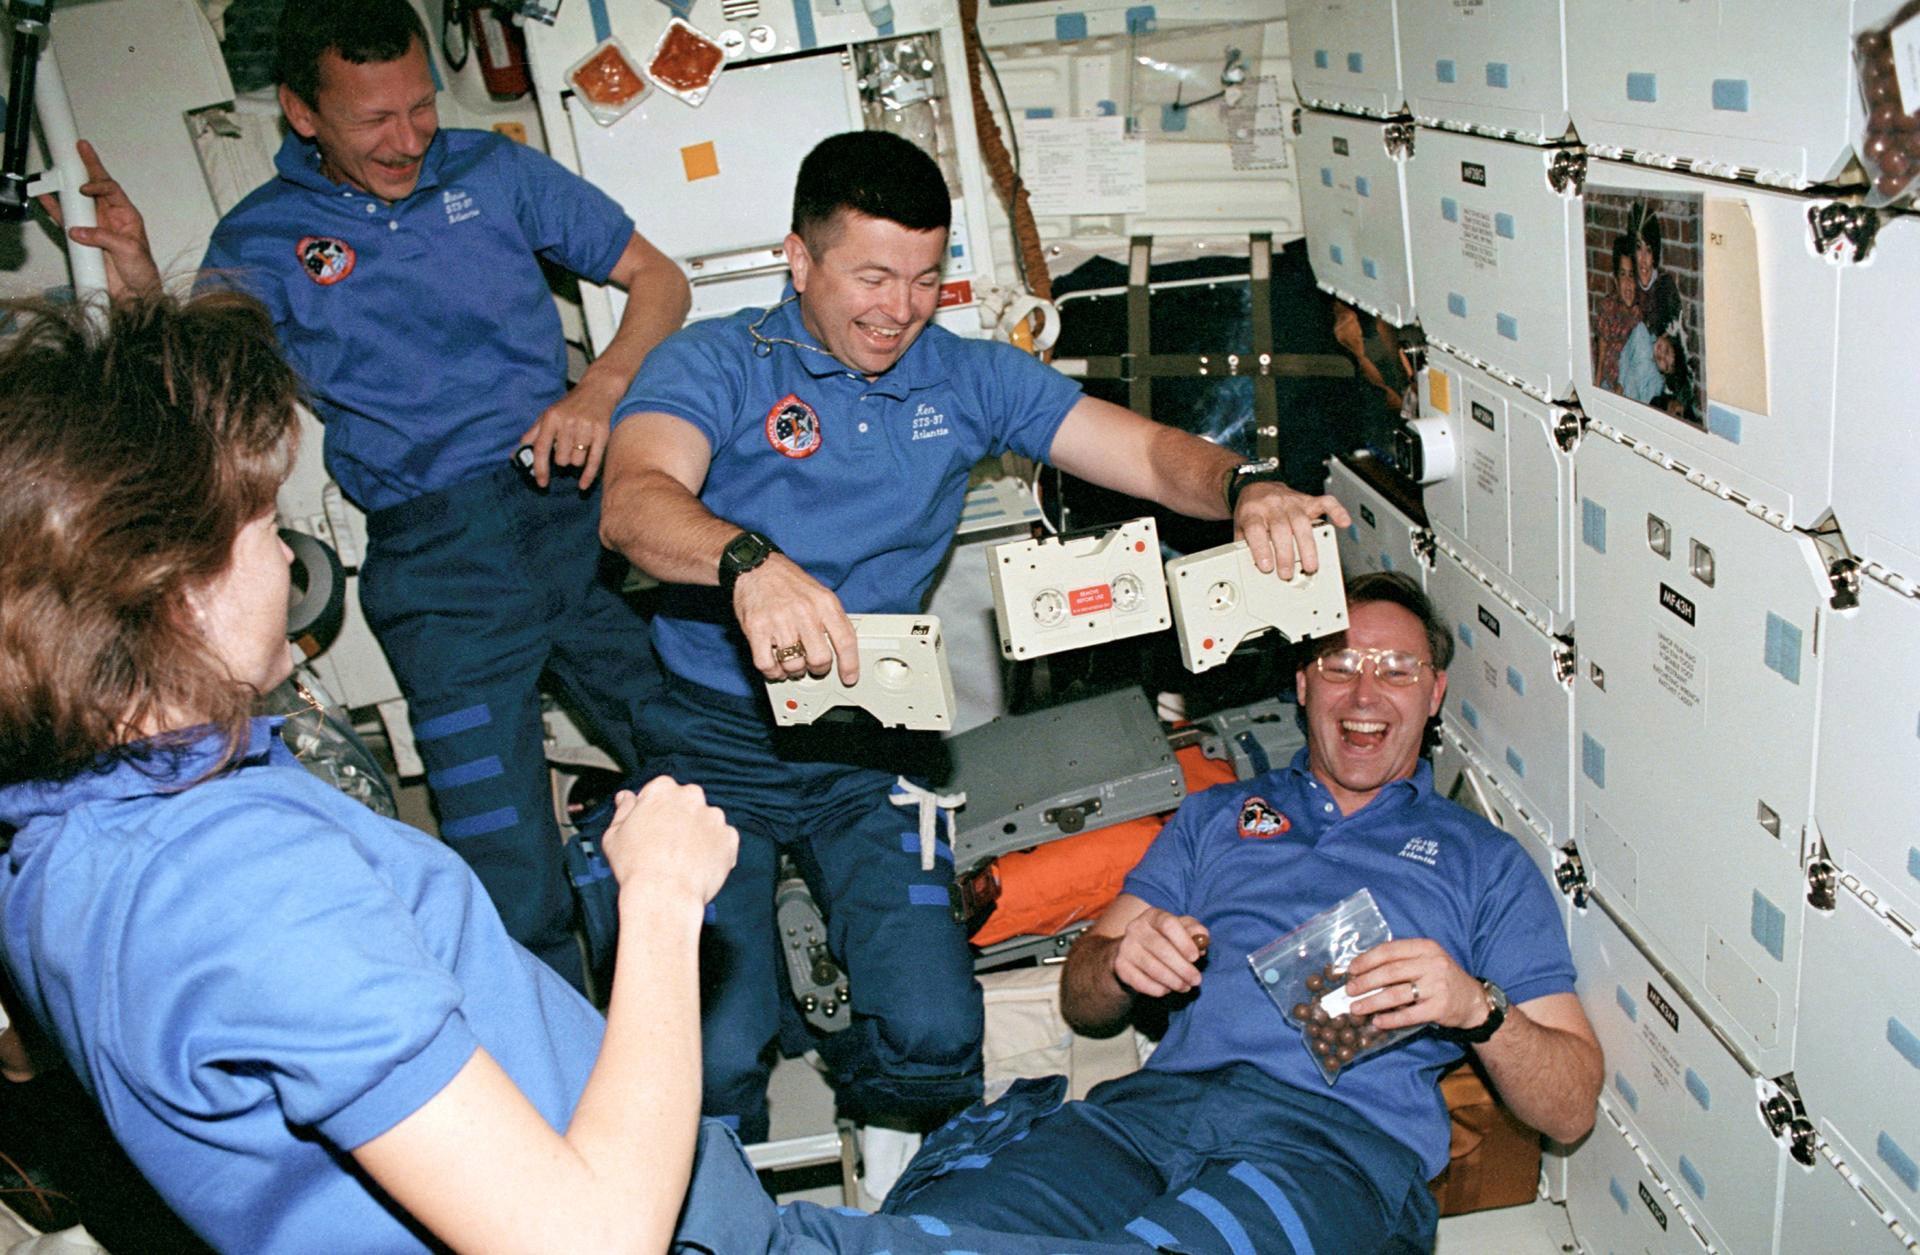 Astronauts having fun